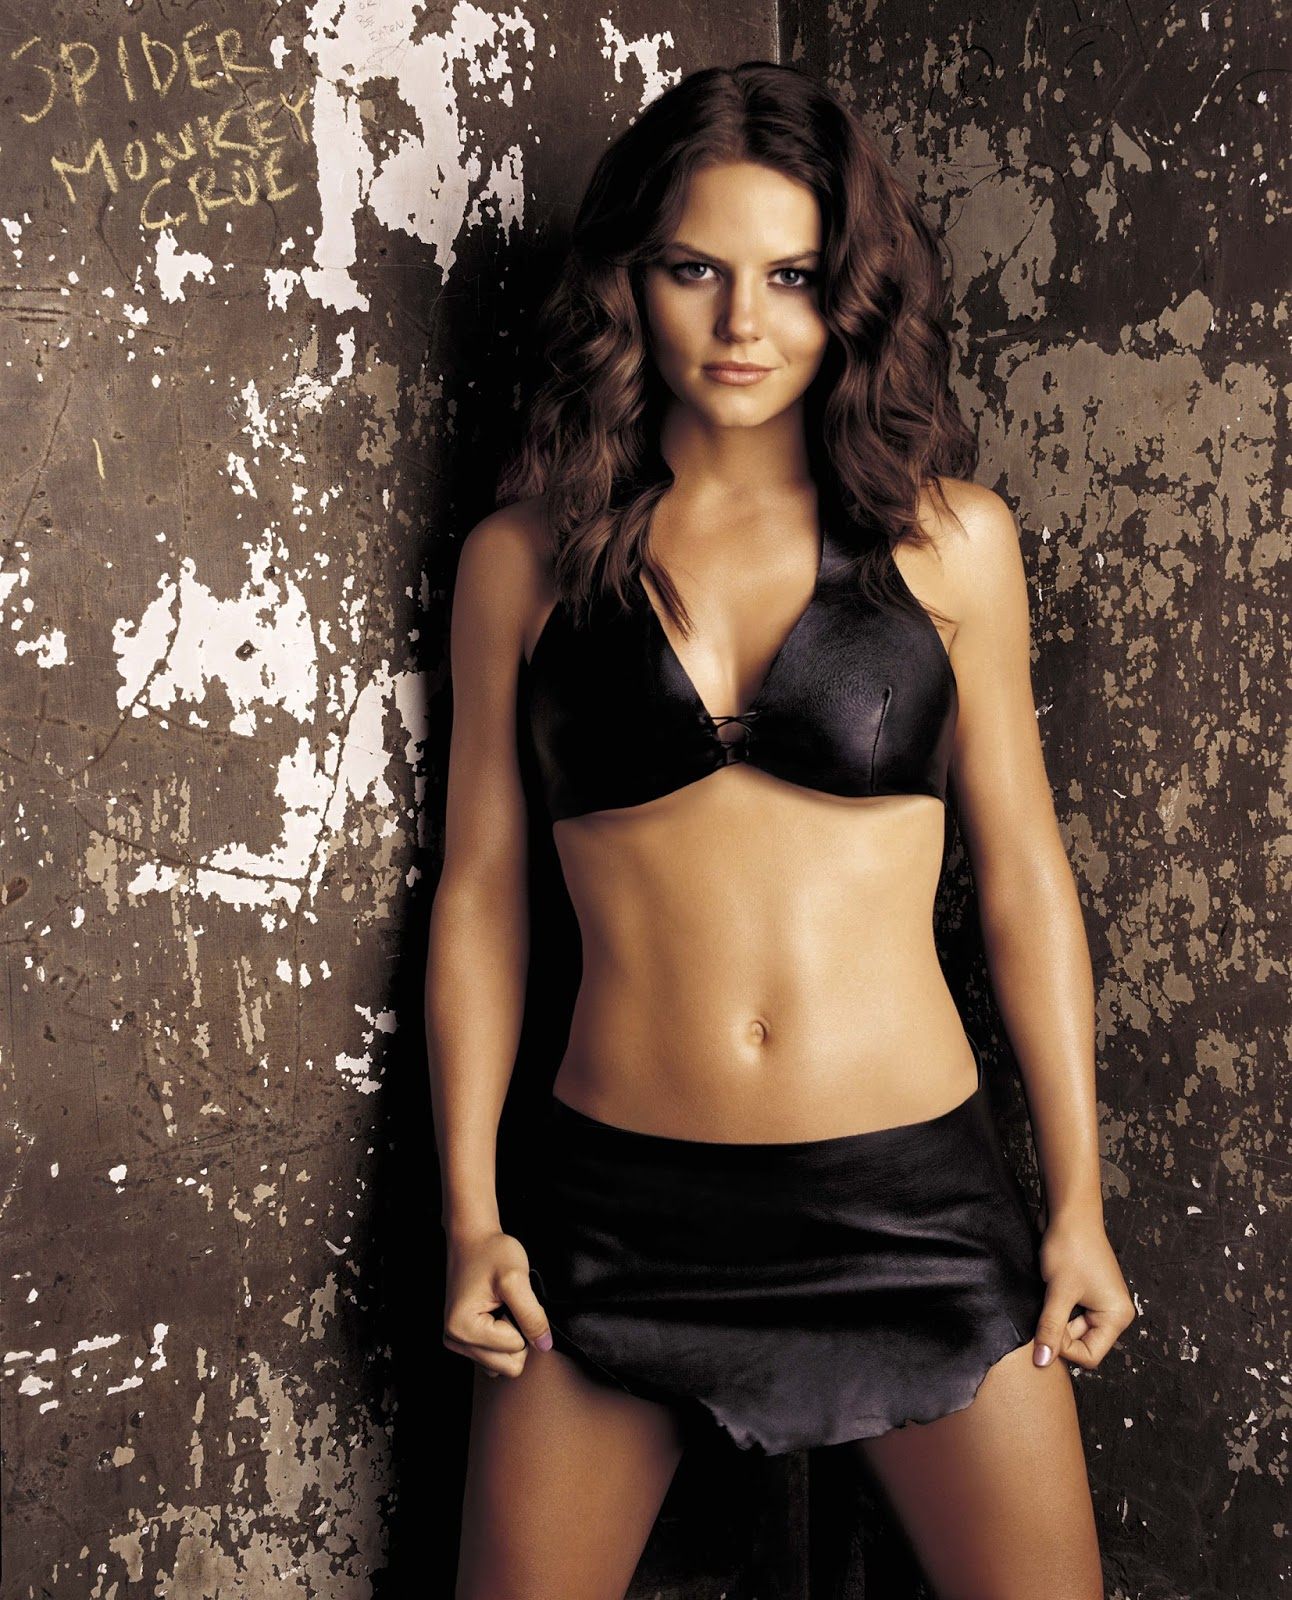 Ideal Jennifer Morrison Urban Legends Nude Pic